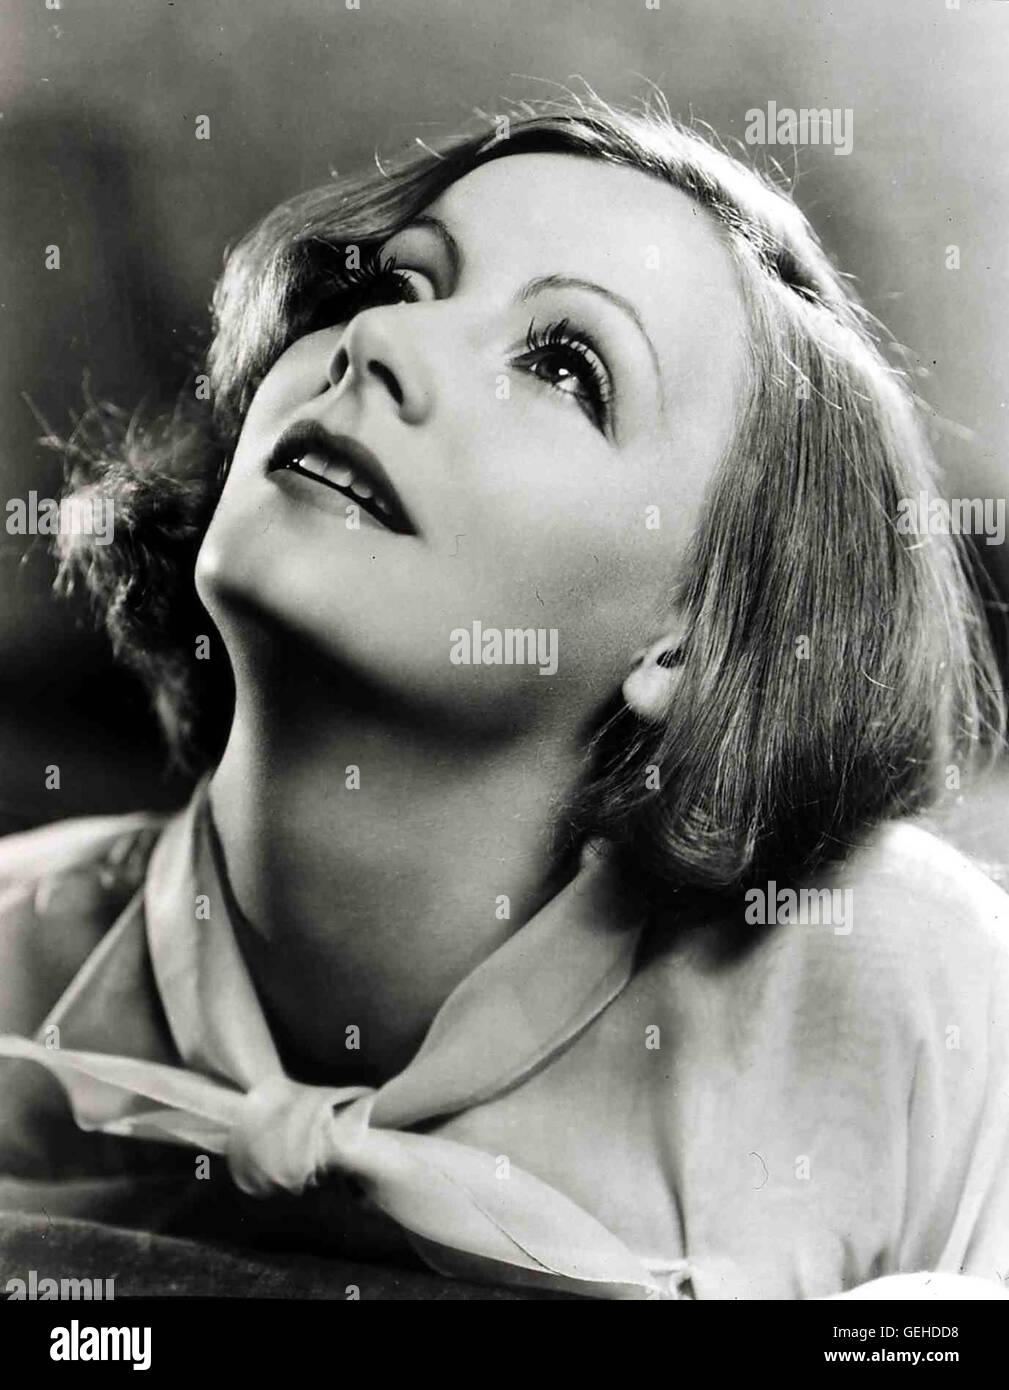 Greta Garbo Portrait circa 1934, 1930s, Garbo, Greta, Portrait, Greta Garbo Stock Photo